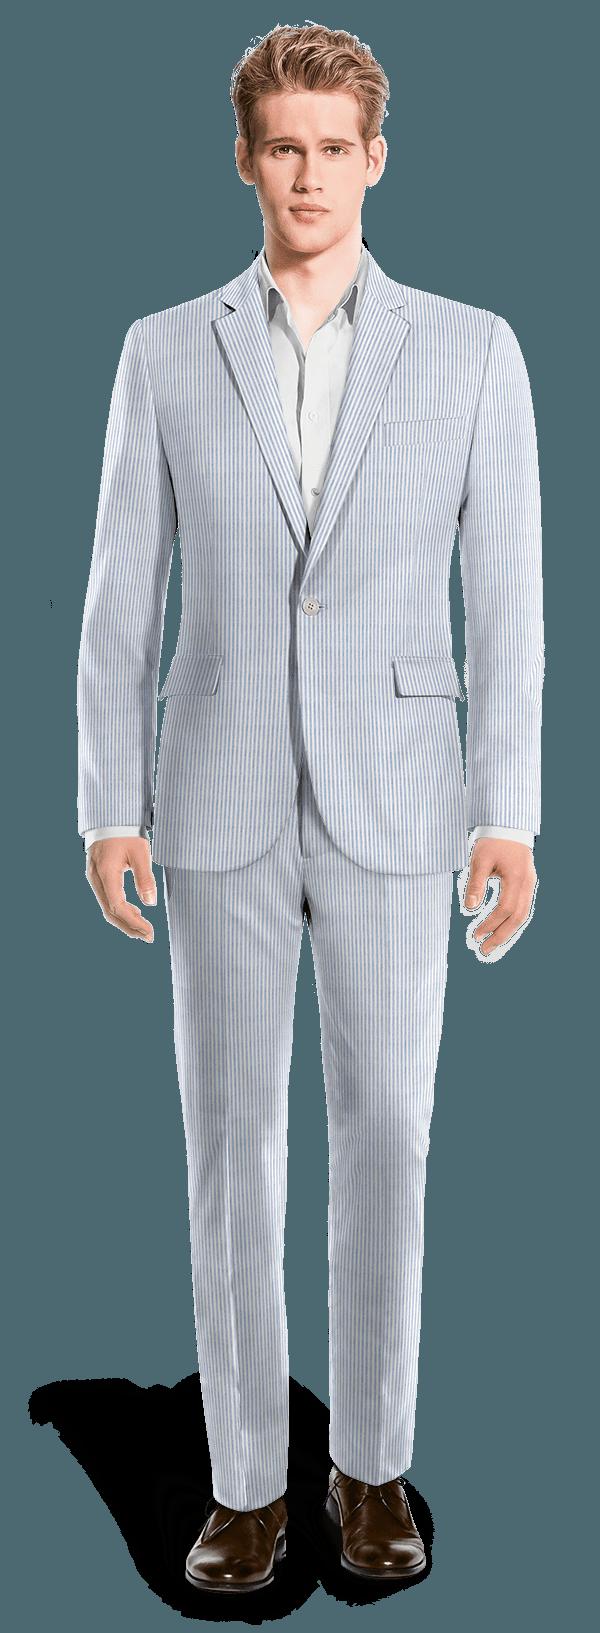 Suits, jackets & pants fabrics | Hockerty